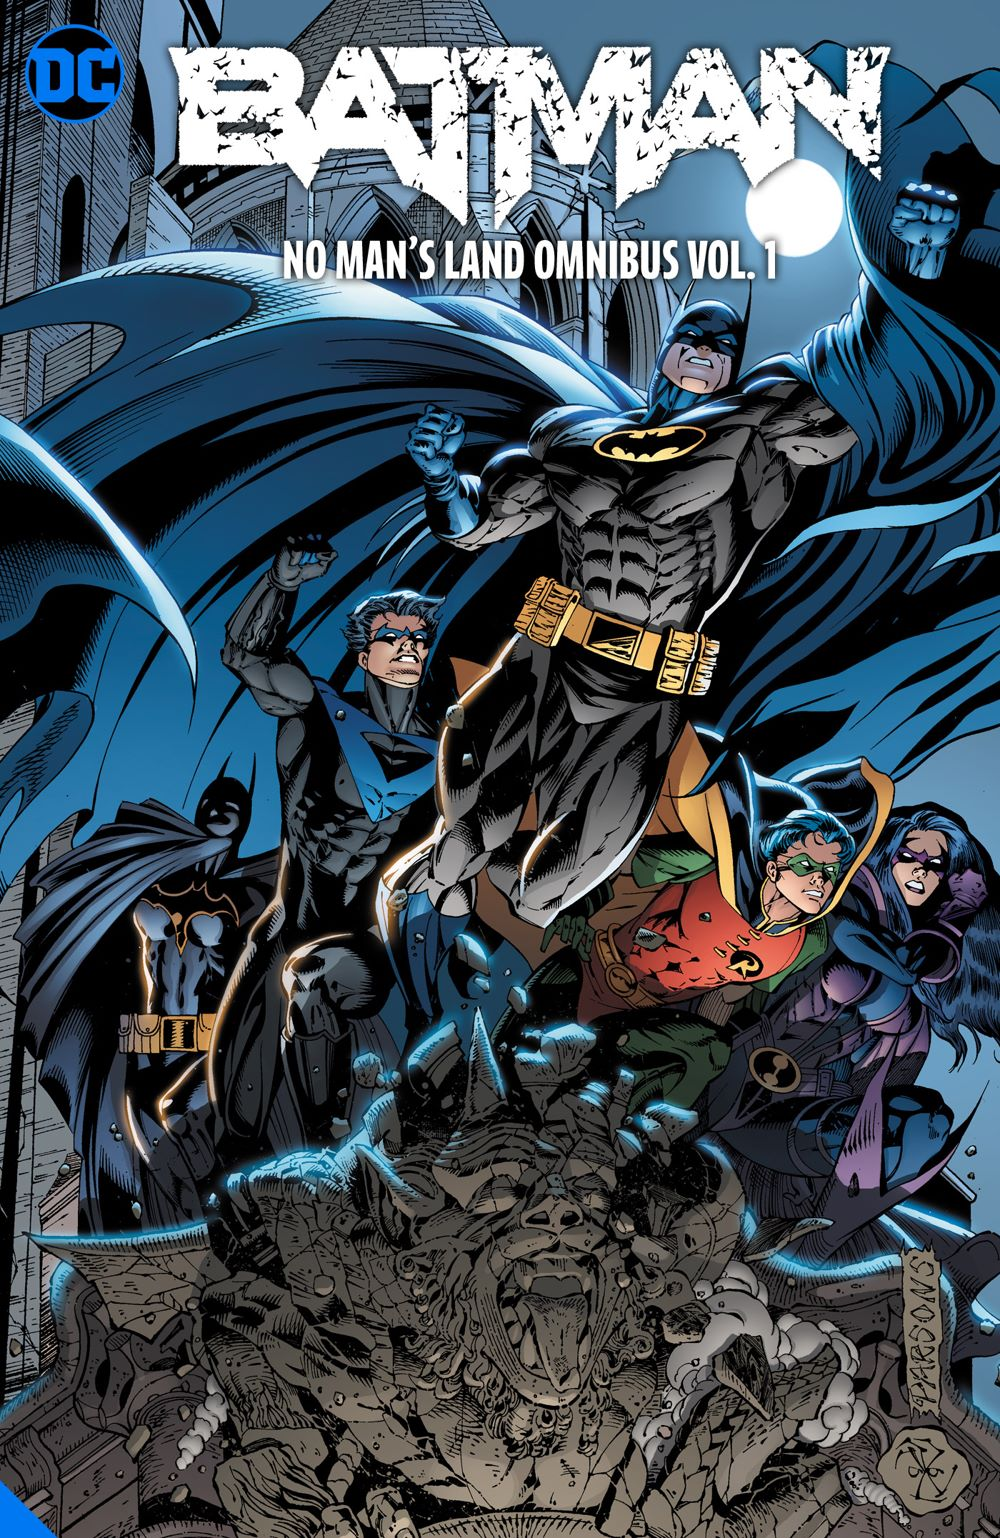 batmannomansland-vol1-omni_adv DC Comics August 2021 Solicitations